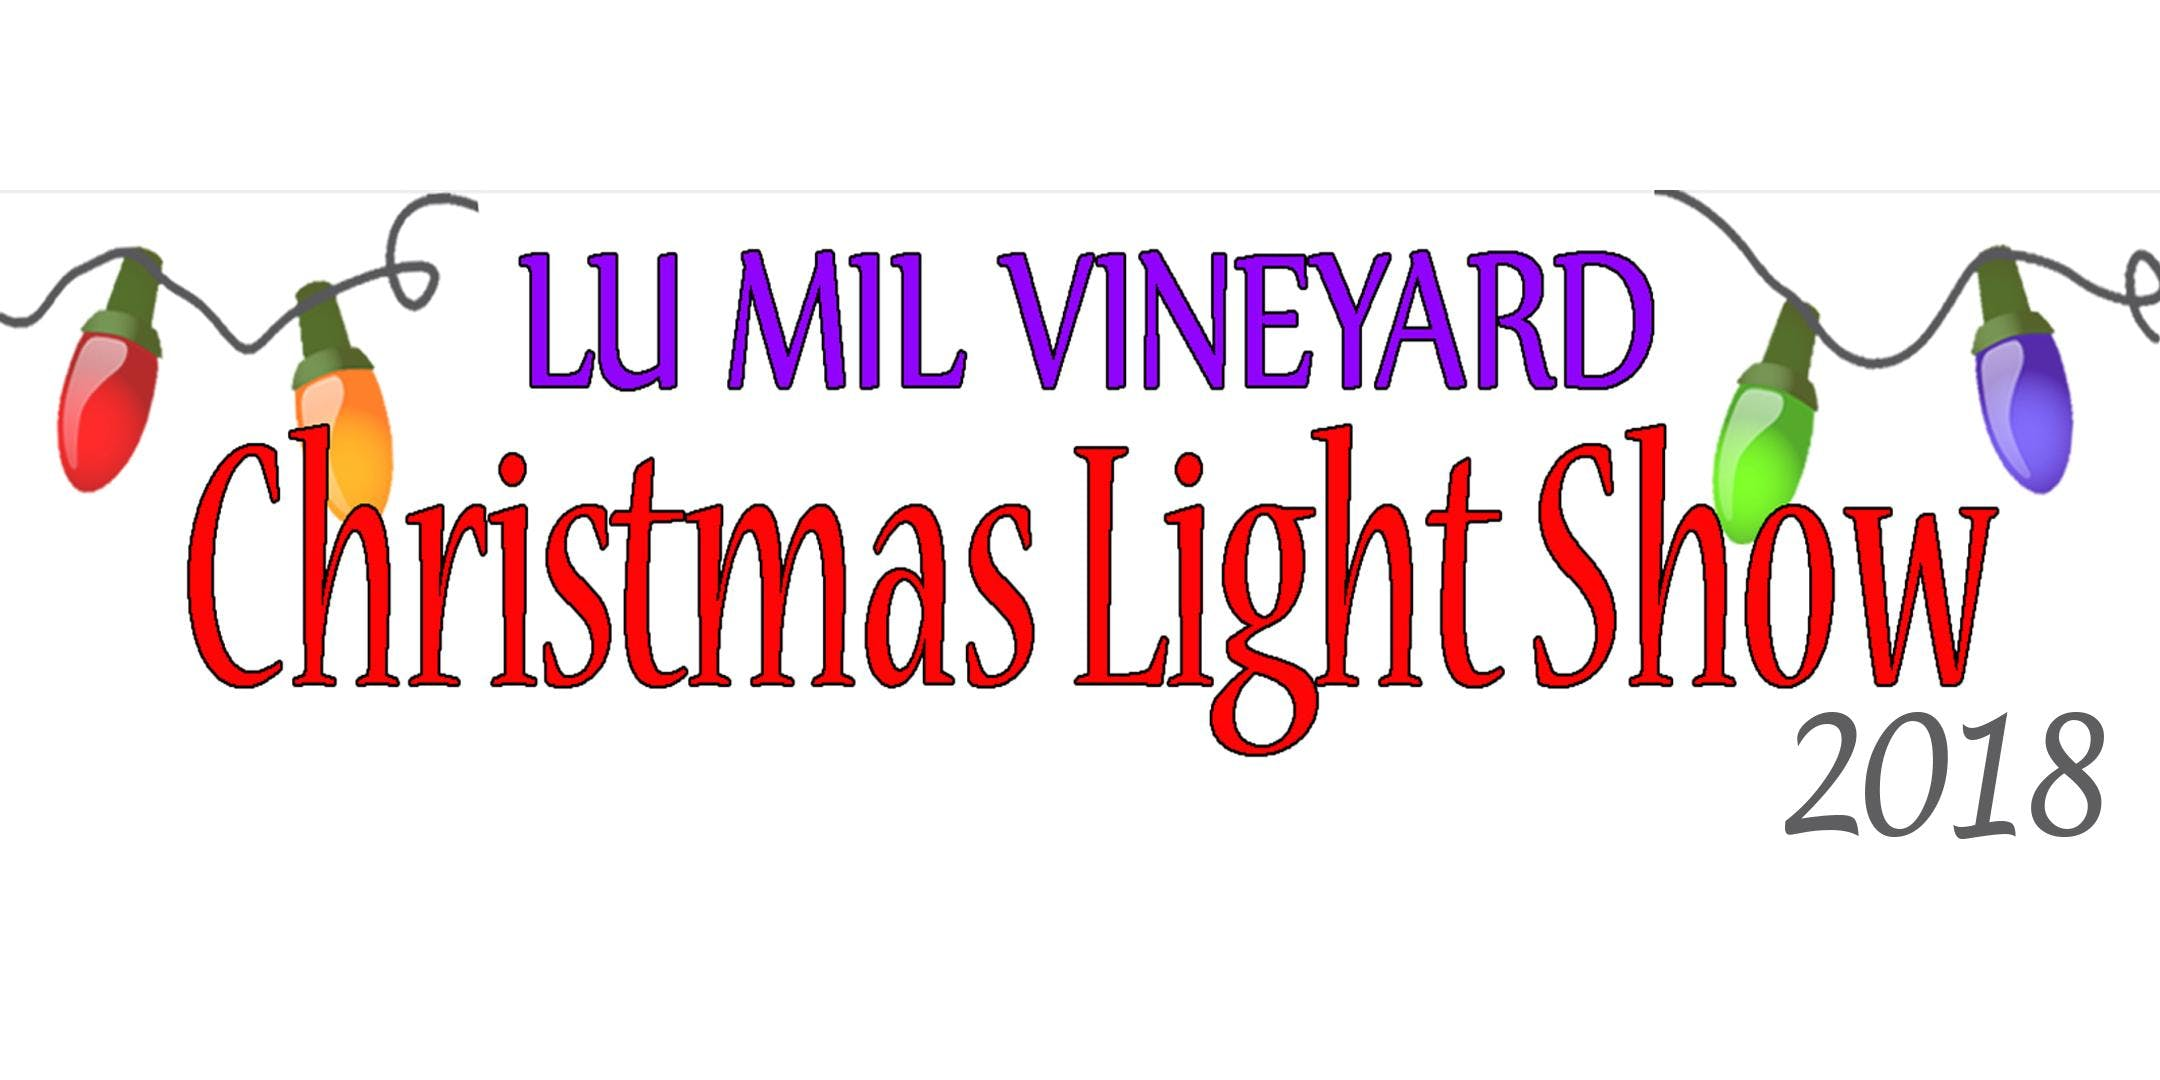 Lu Mil Vineyard Festival of Lights 2018 - 24 NOV 2018